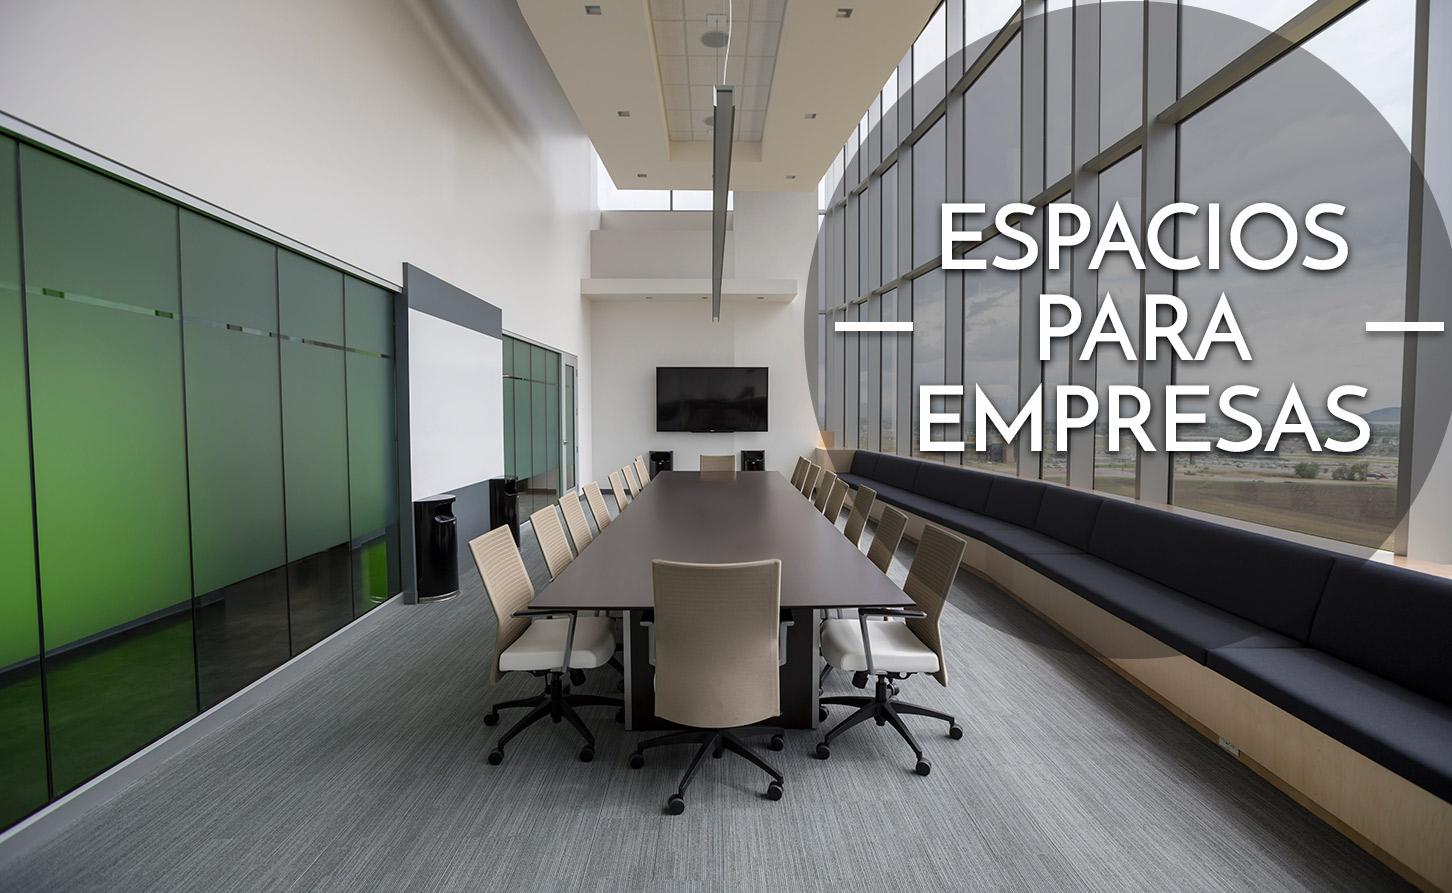 espacios para empresas